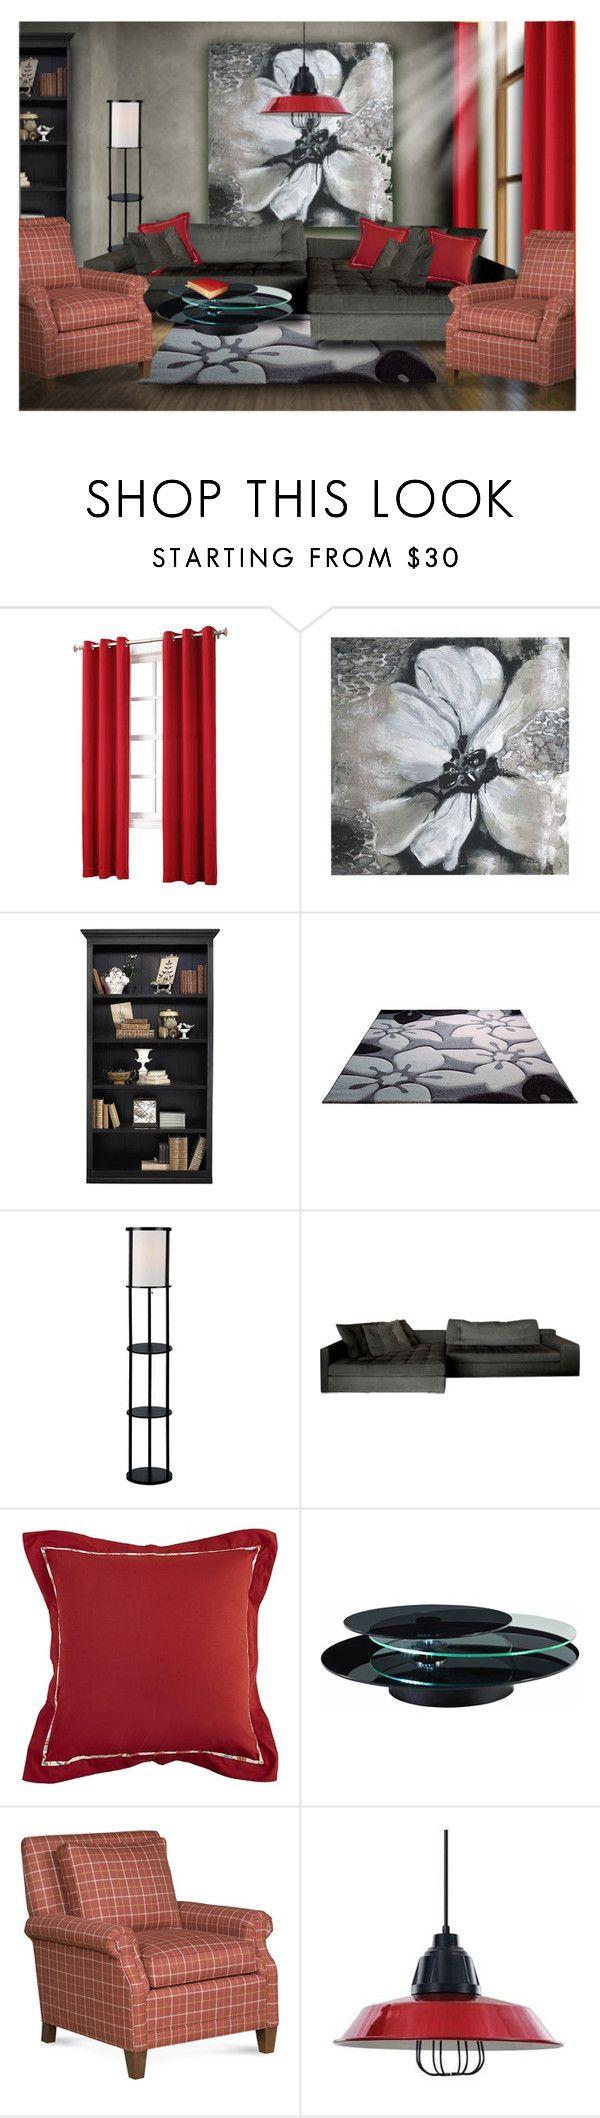 """Living Room Design"" by erina-i ❤ liked on Polyvore featuring interior, interiors, interior design, home, home decor, interior decorating, Sun Zero, Ballard Designs, Home Decorators Collection and Pier 1 Imports"